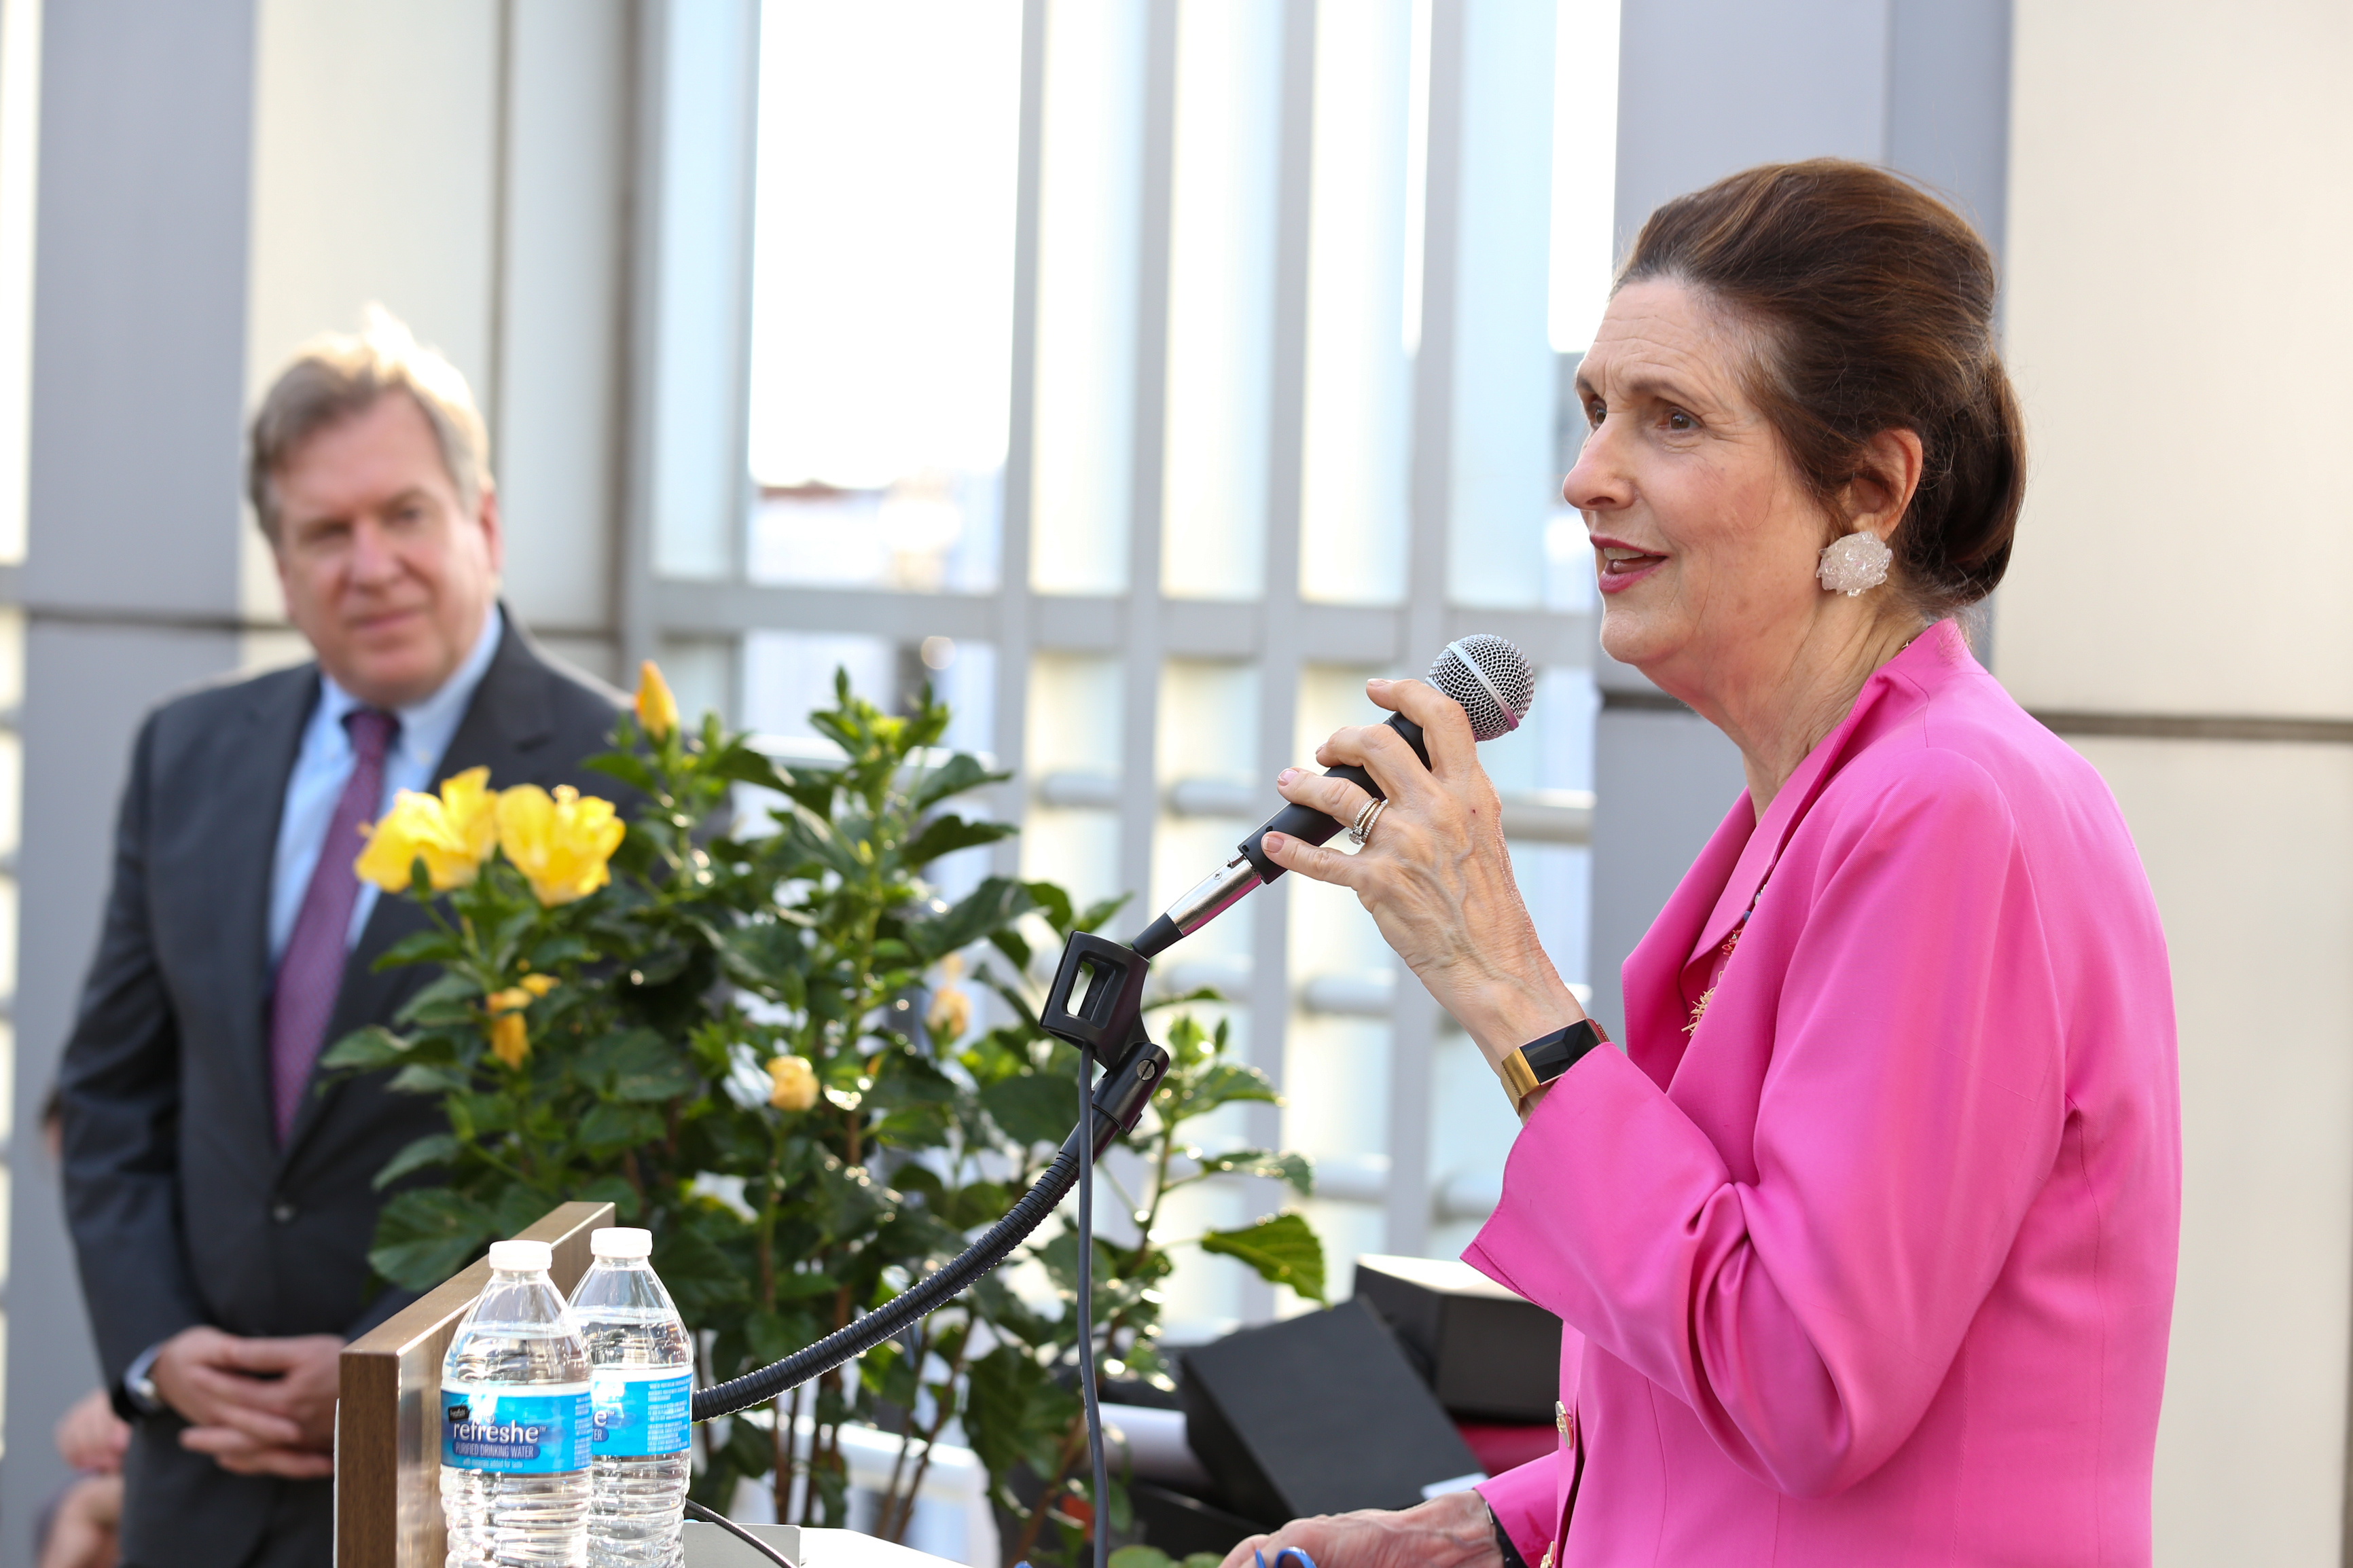 Lynda Johnson Robb addresses the LBJ School's DC alumni and the 2019 DC Fellows at the DC Alumni Reception June 6, 2019